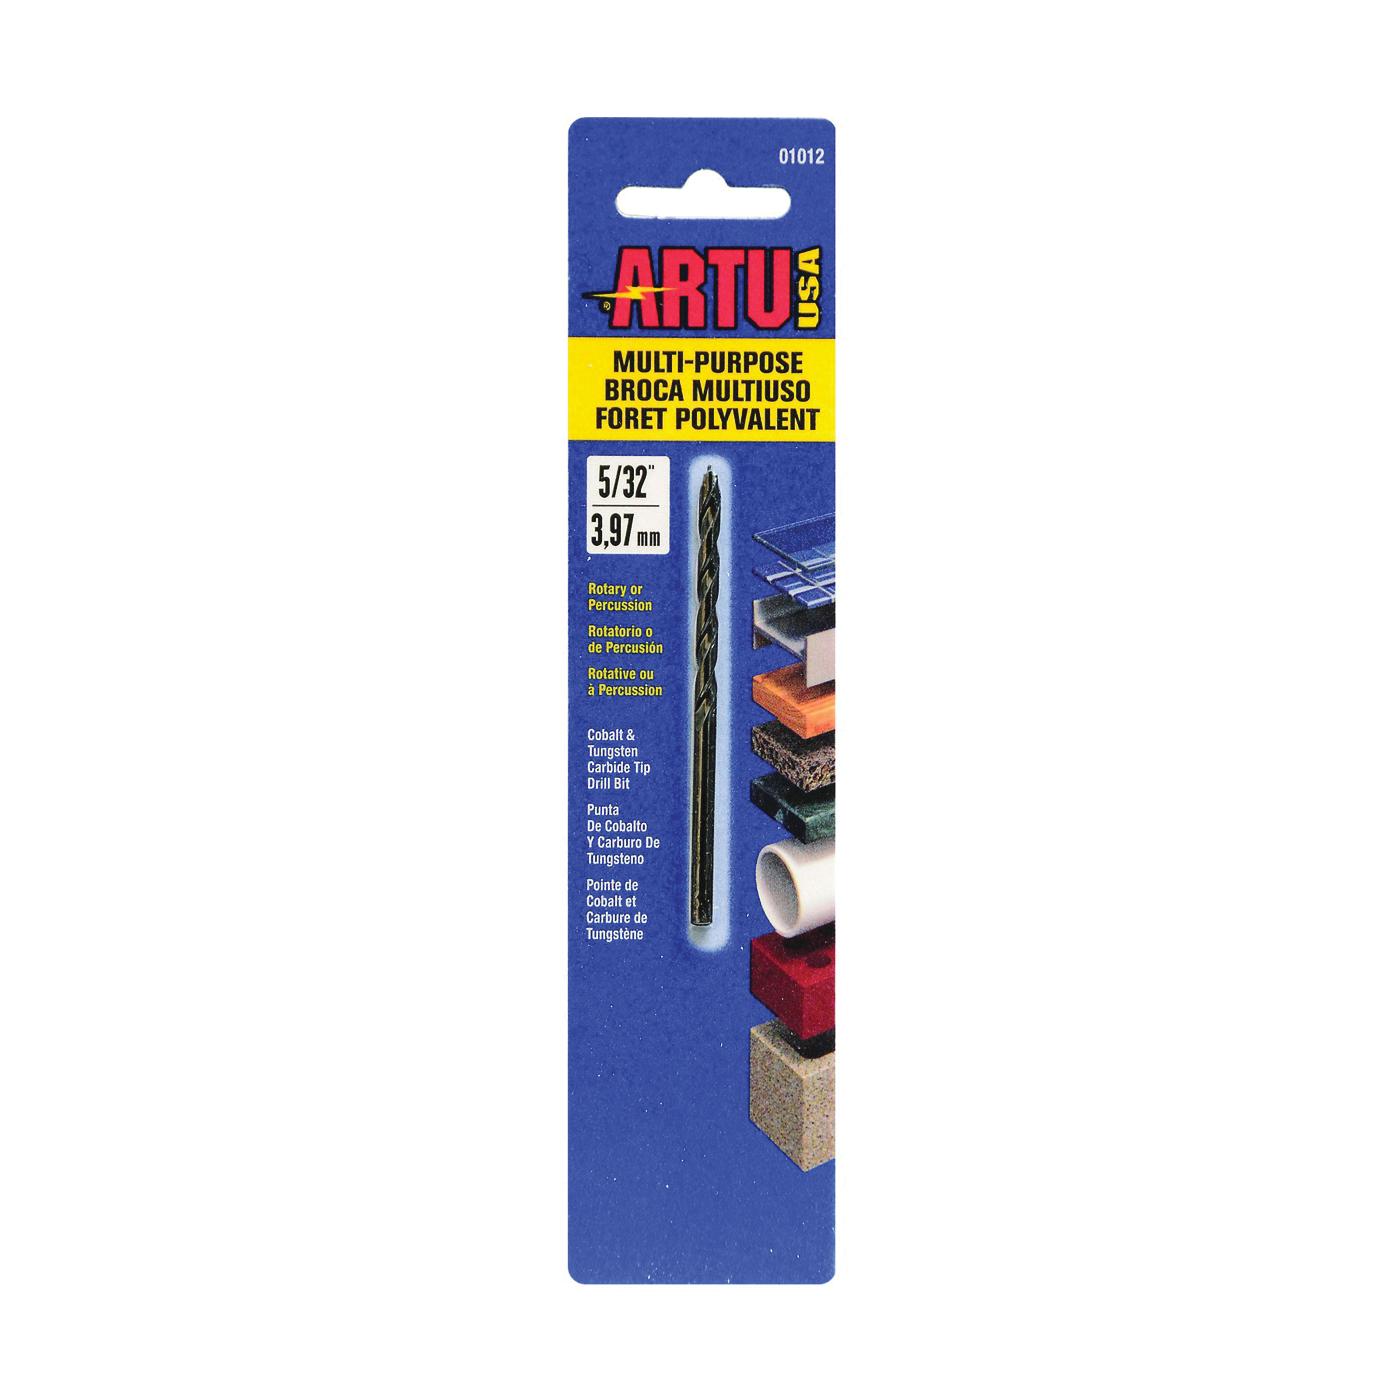 Picture of ARTU 01012 Drill Bit, 5/32 in Dia, 3-1/8 in OAL, Jobber Bit, Parabolic Flute, 5/32 in Dia Shank, Straight Shank